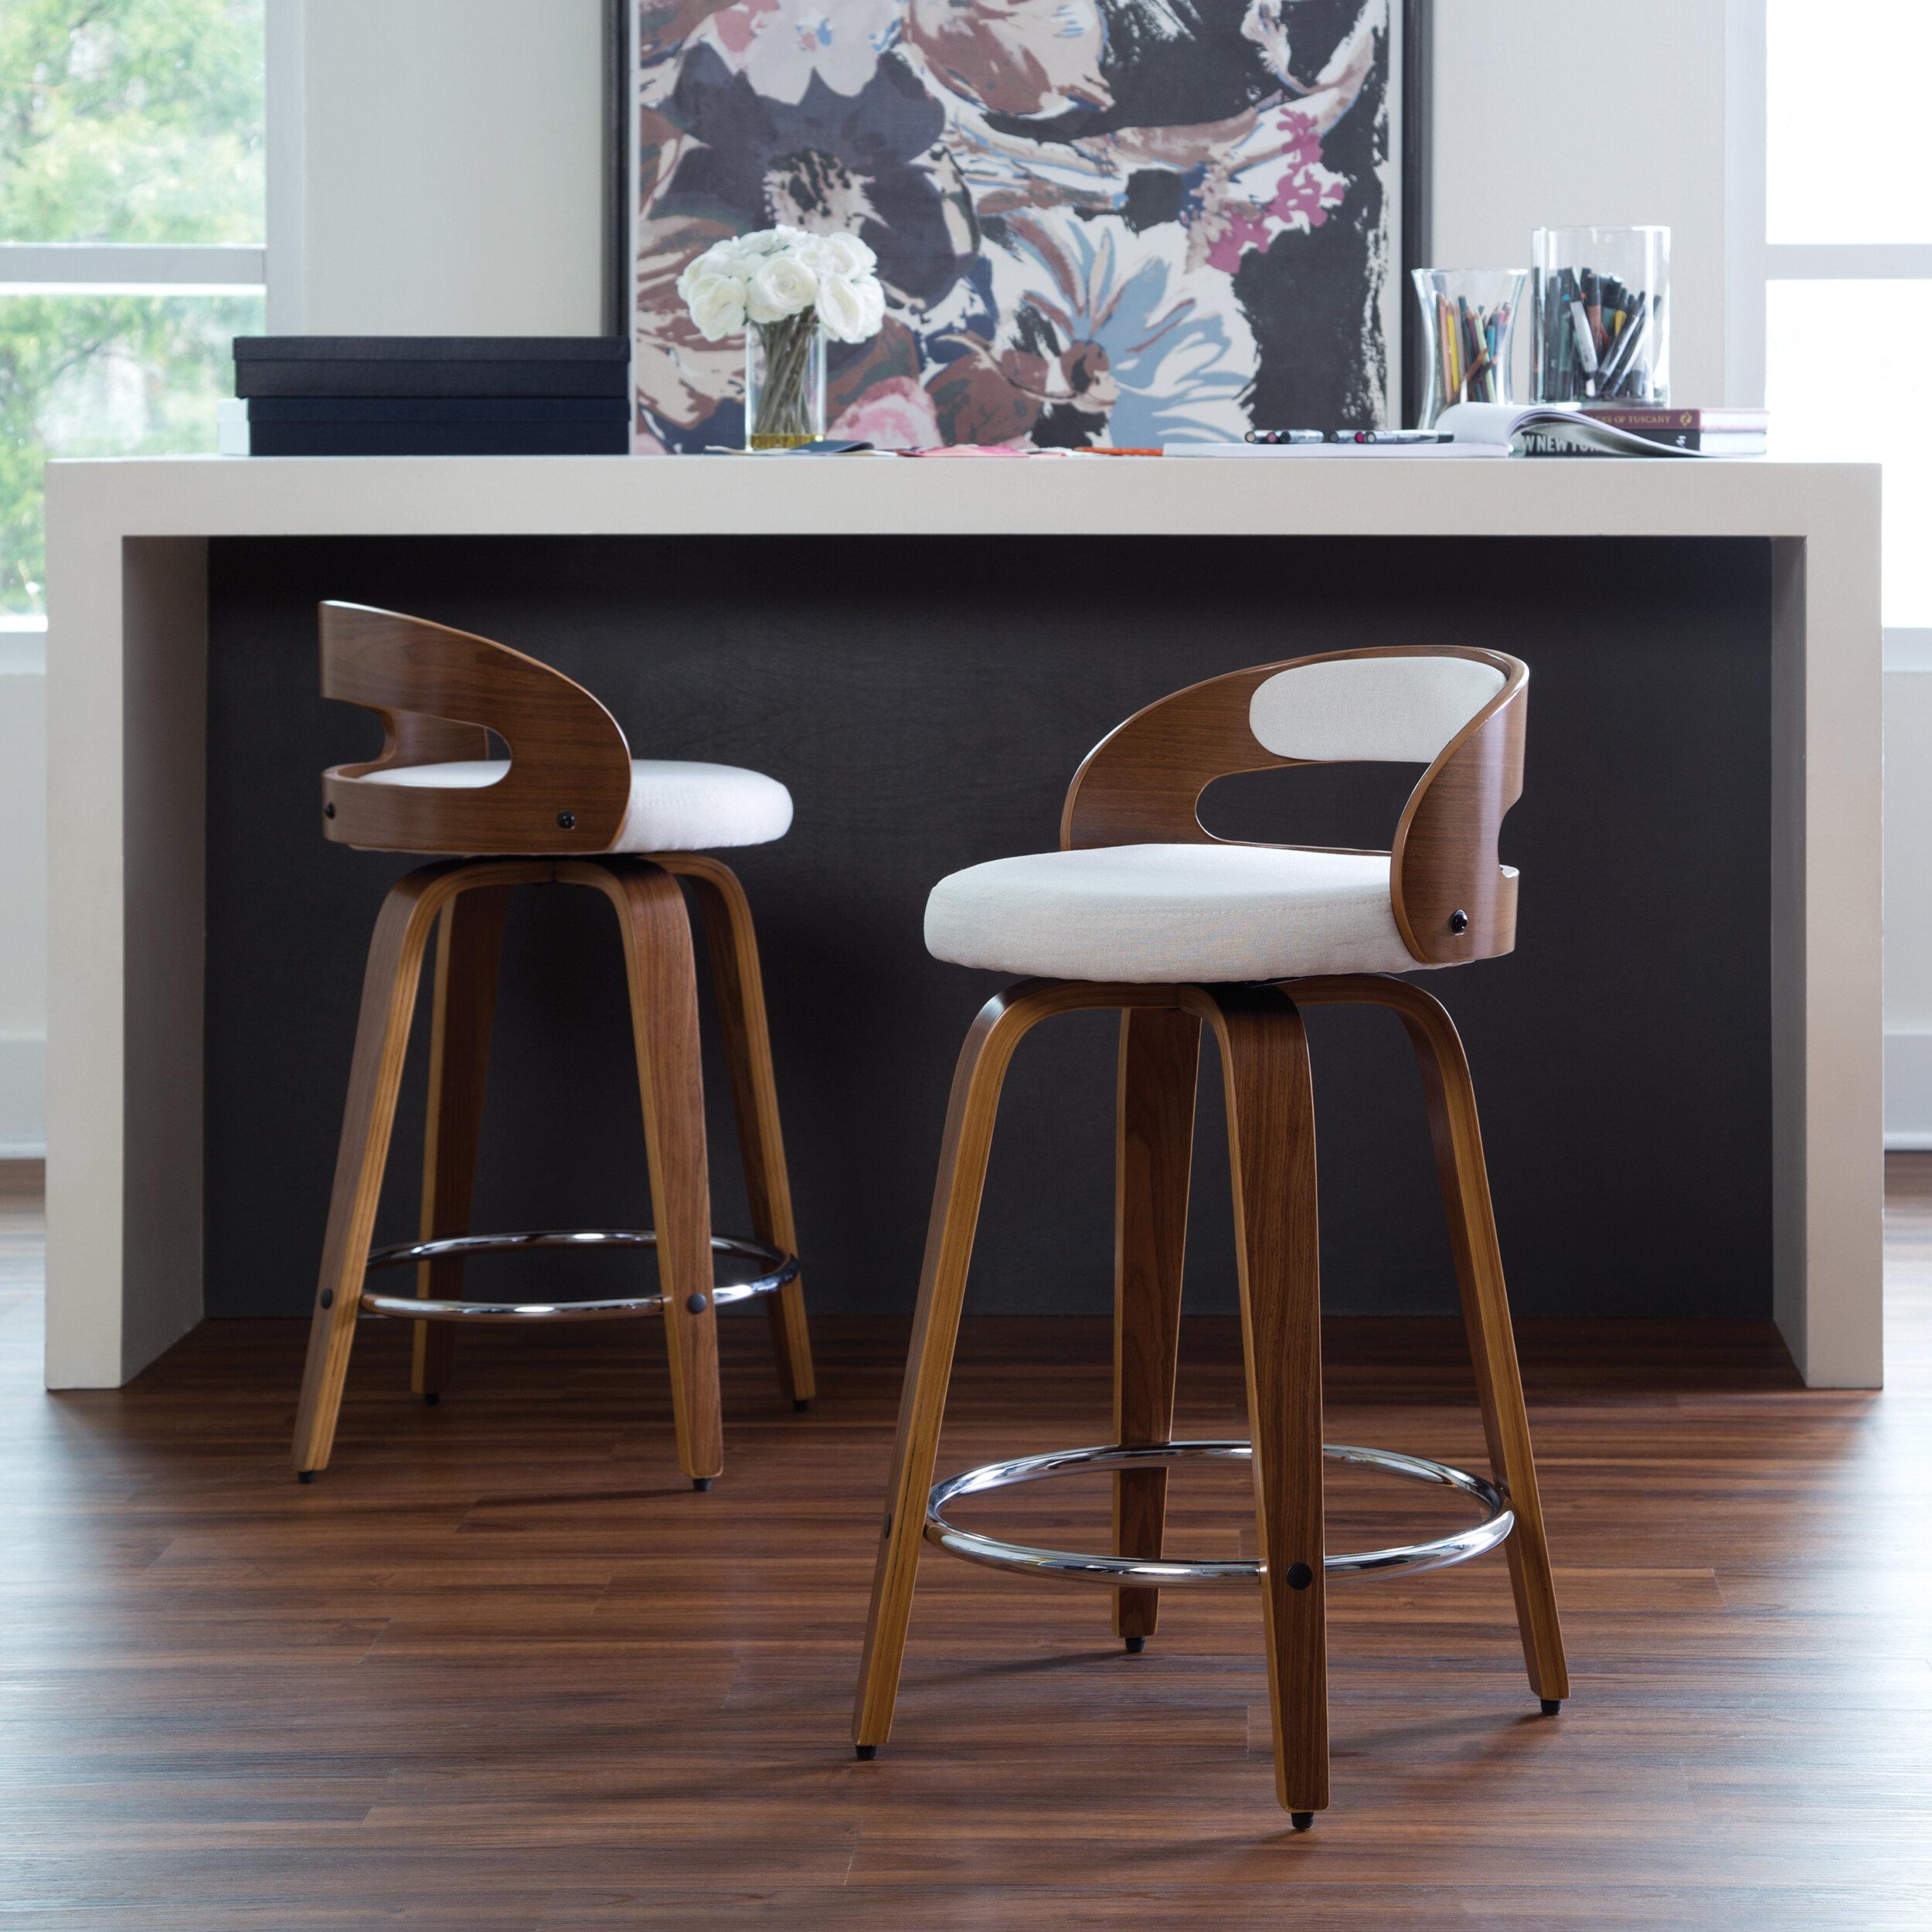 Peachy Lacayo Mid Century Modern Low Back Bentwood Frame 24 Swivel Bar Stool Cjindustries Chair Design For Home Cjindustriesco